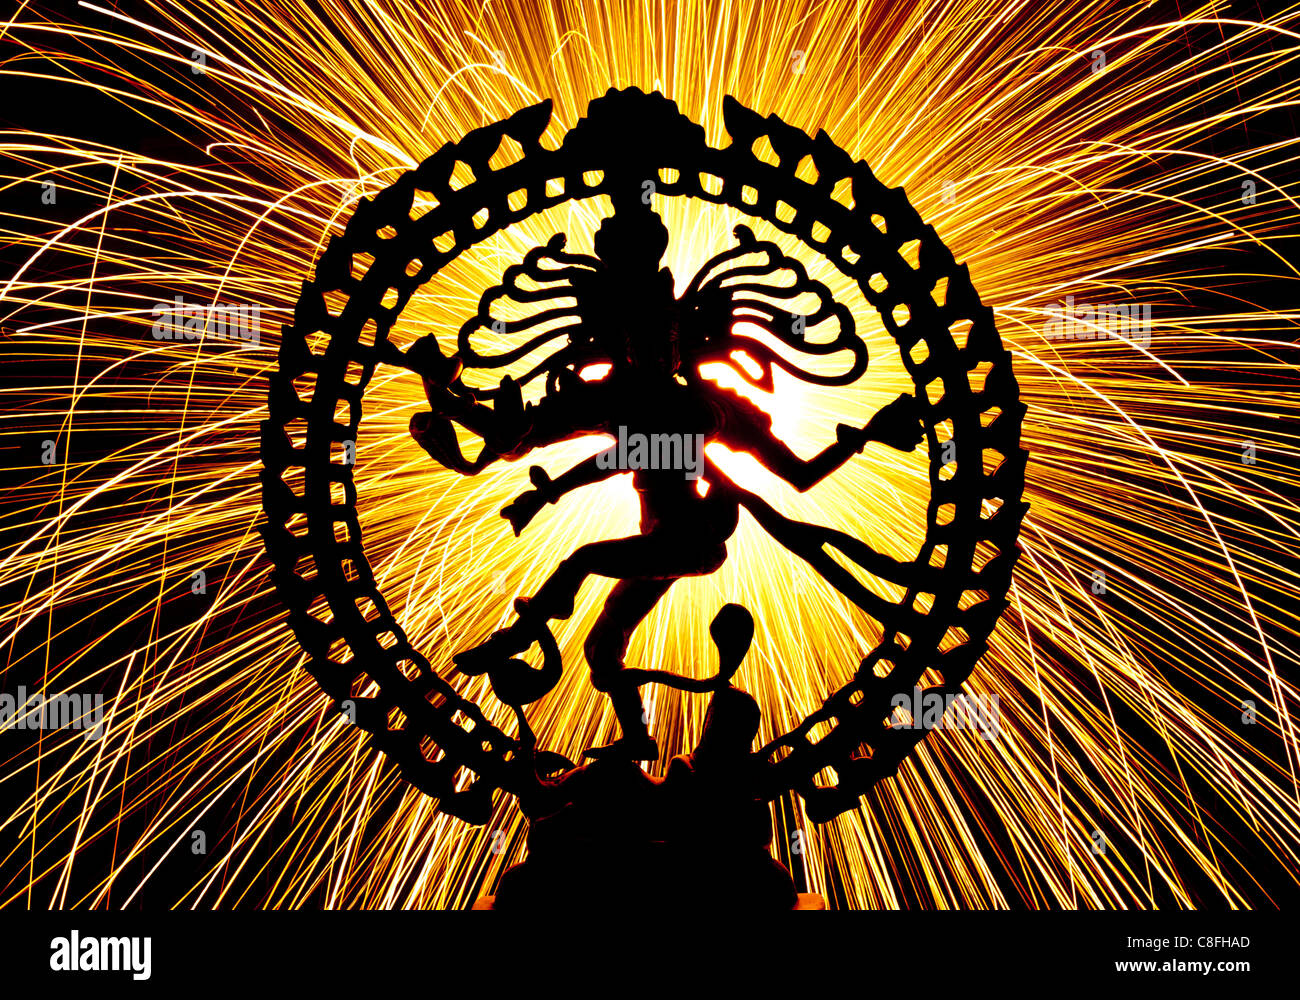 Funken tanzen Lord Shiva Statue, Nataraja, vor Feuerwerk. Silhouette Stockbild